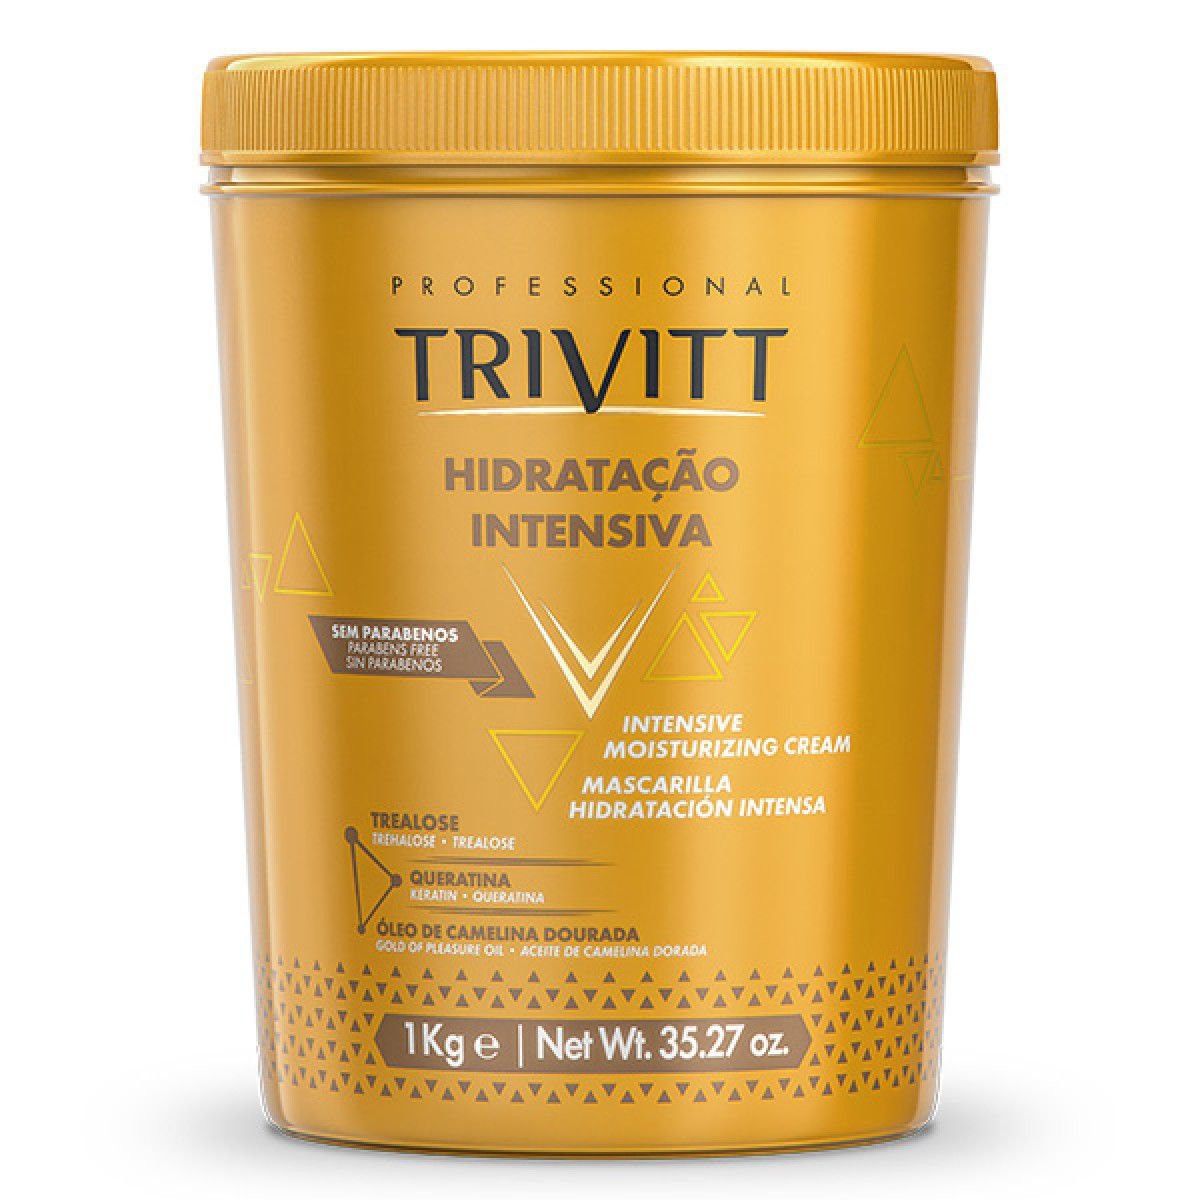 Máscara de Hidratação Intensiva Trivitt 1kg